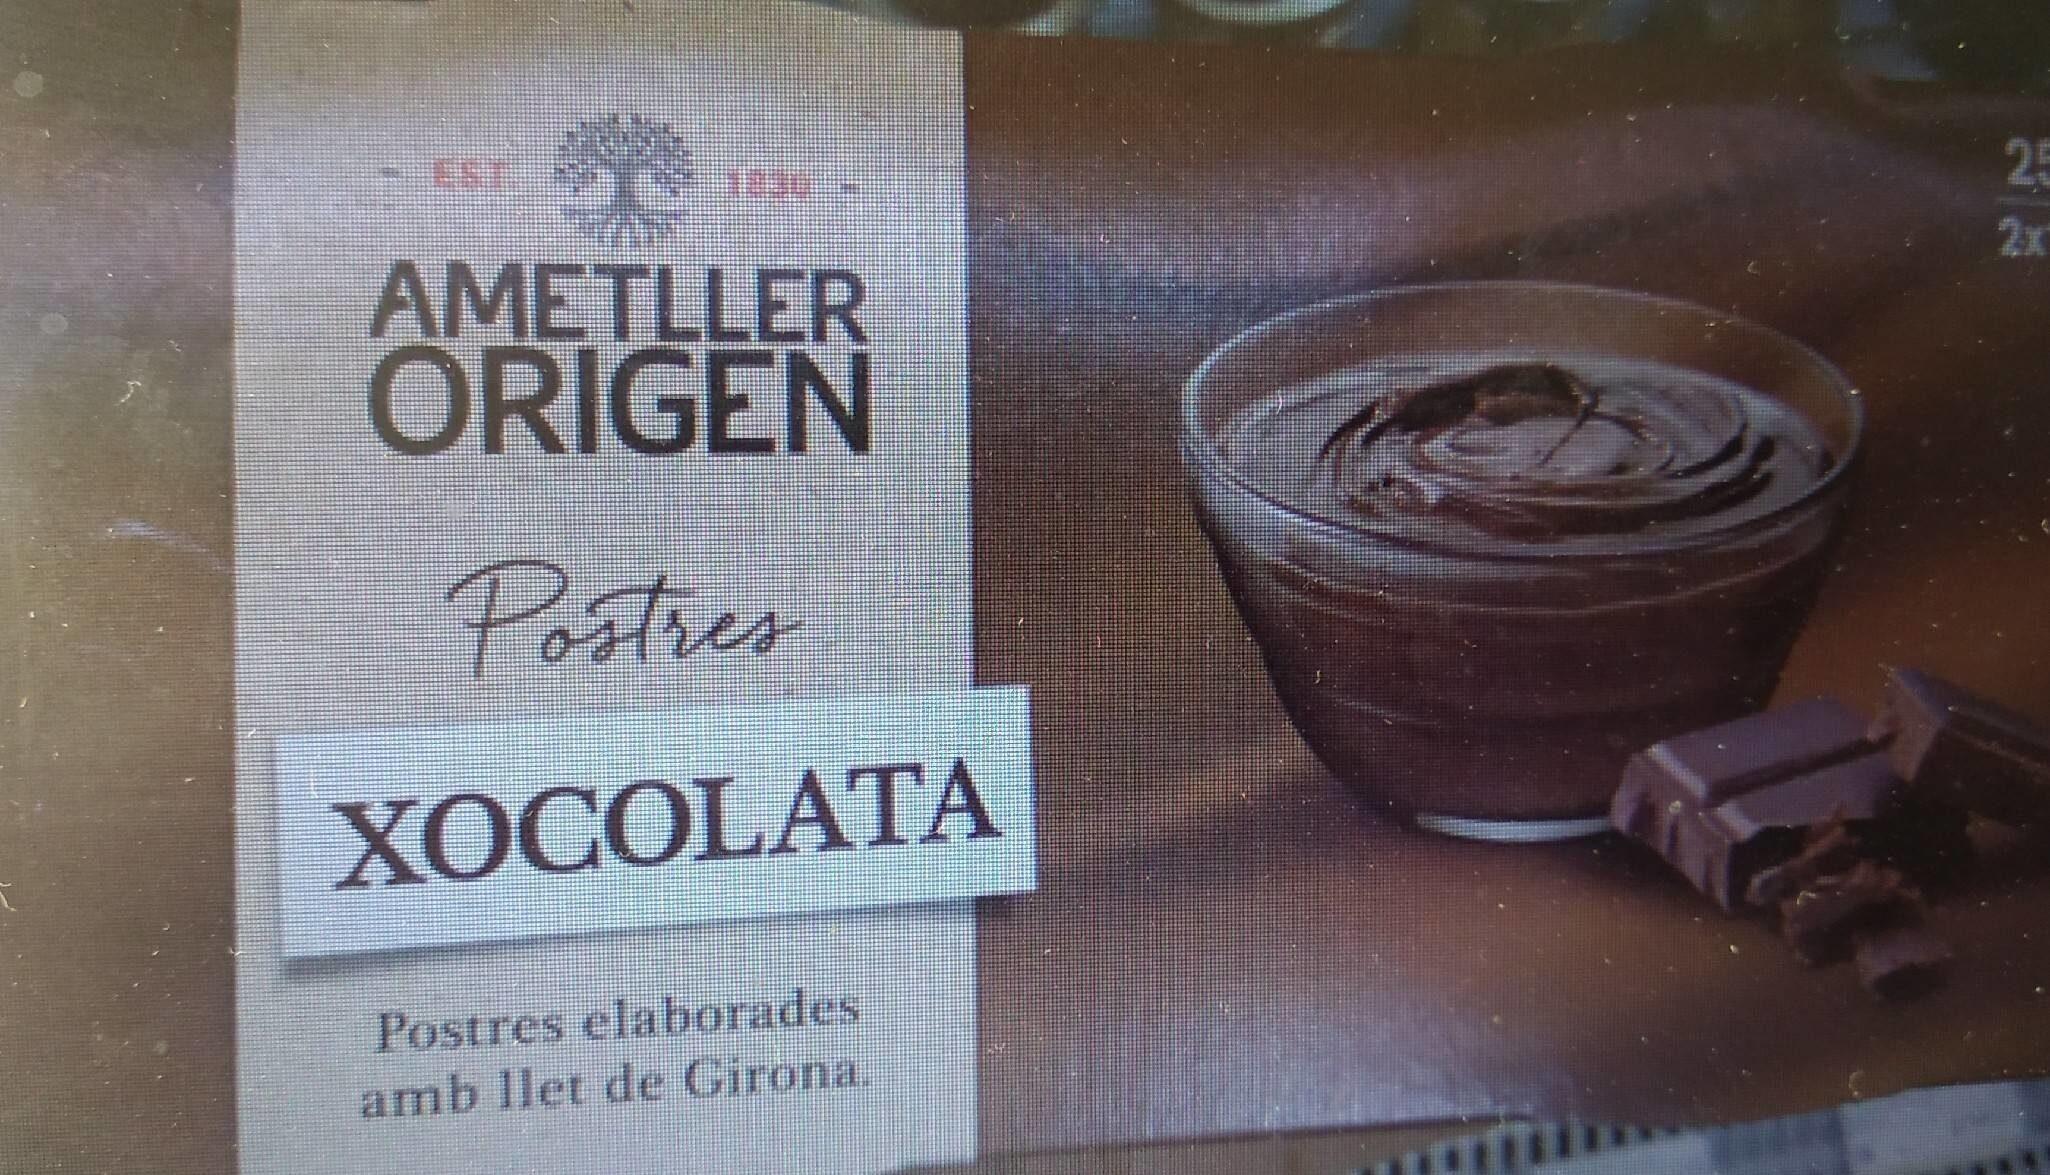 Postres xocolata - Product